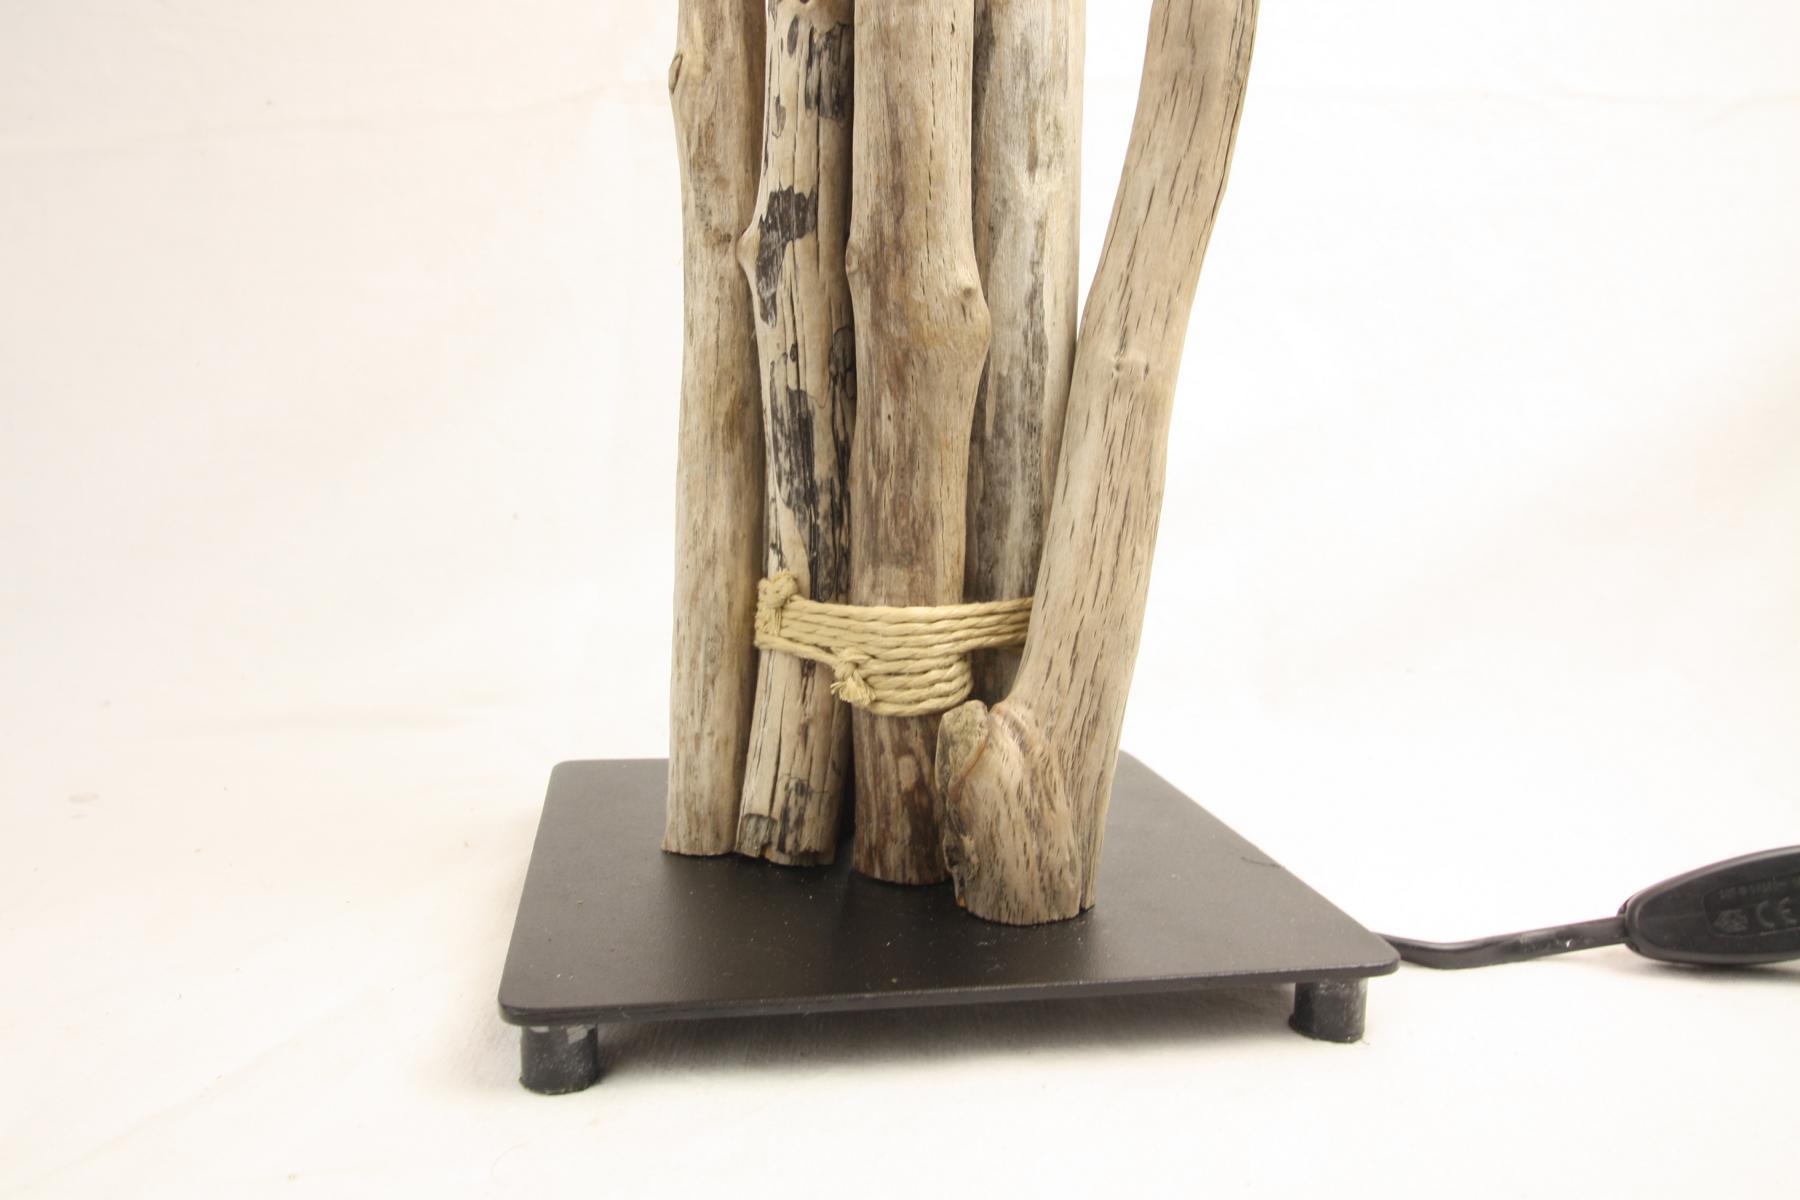 treibholz lampe mit schirm. Black Bedroom Furniture Sets. Home Design Ideas